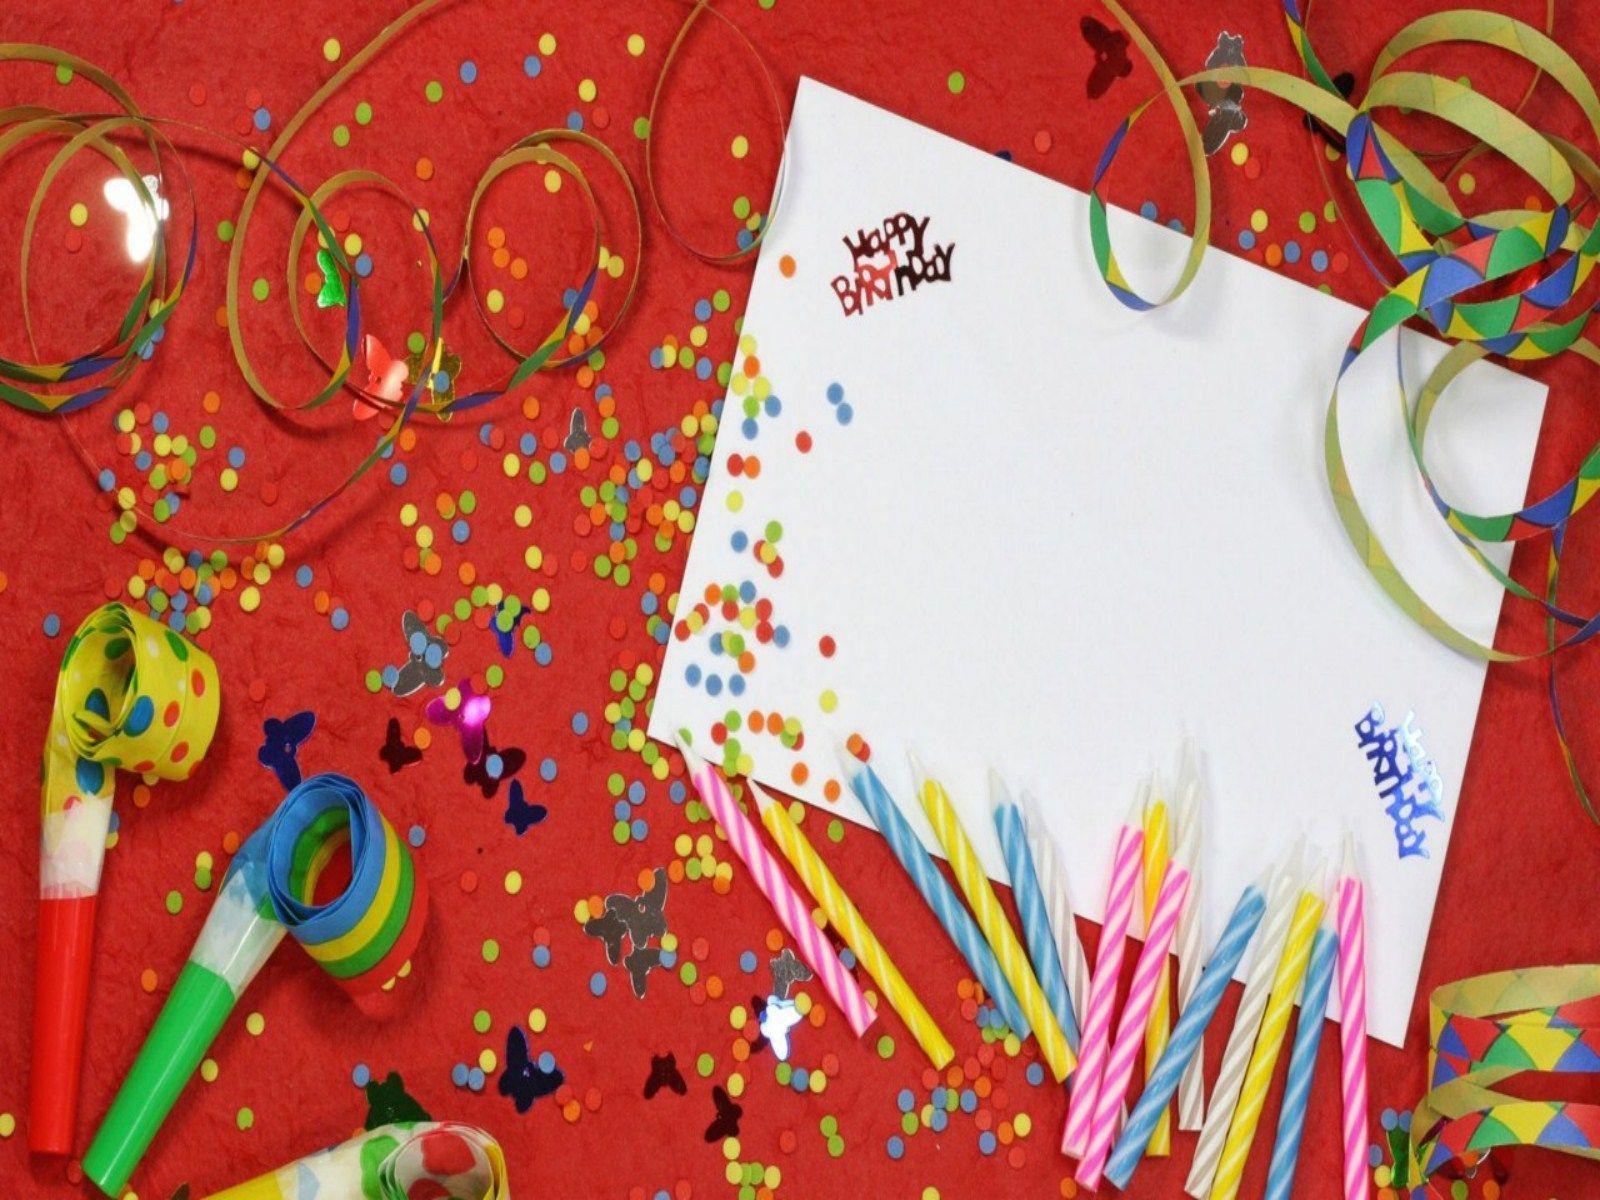 hd birthday wallpapers free - photo #42